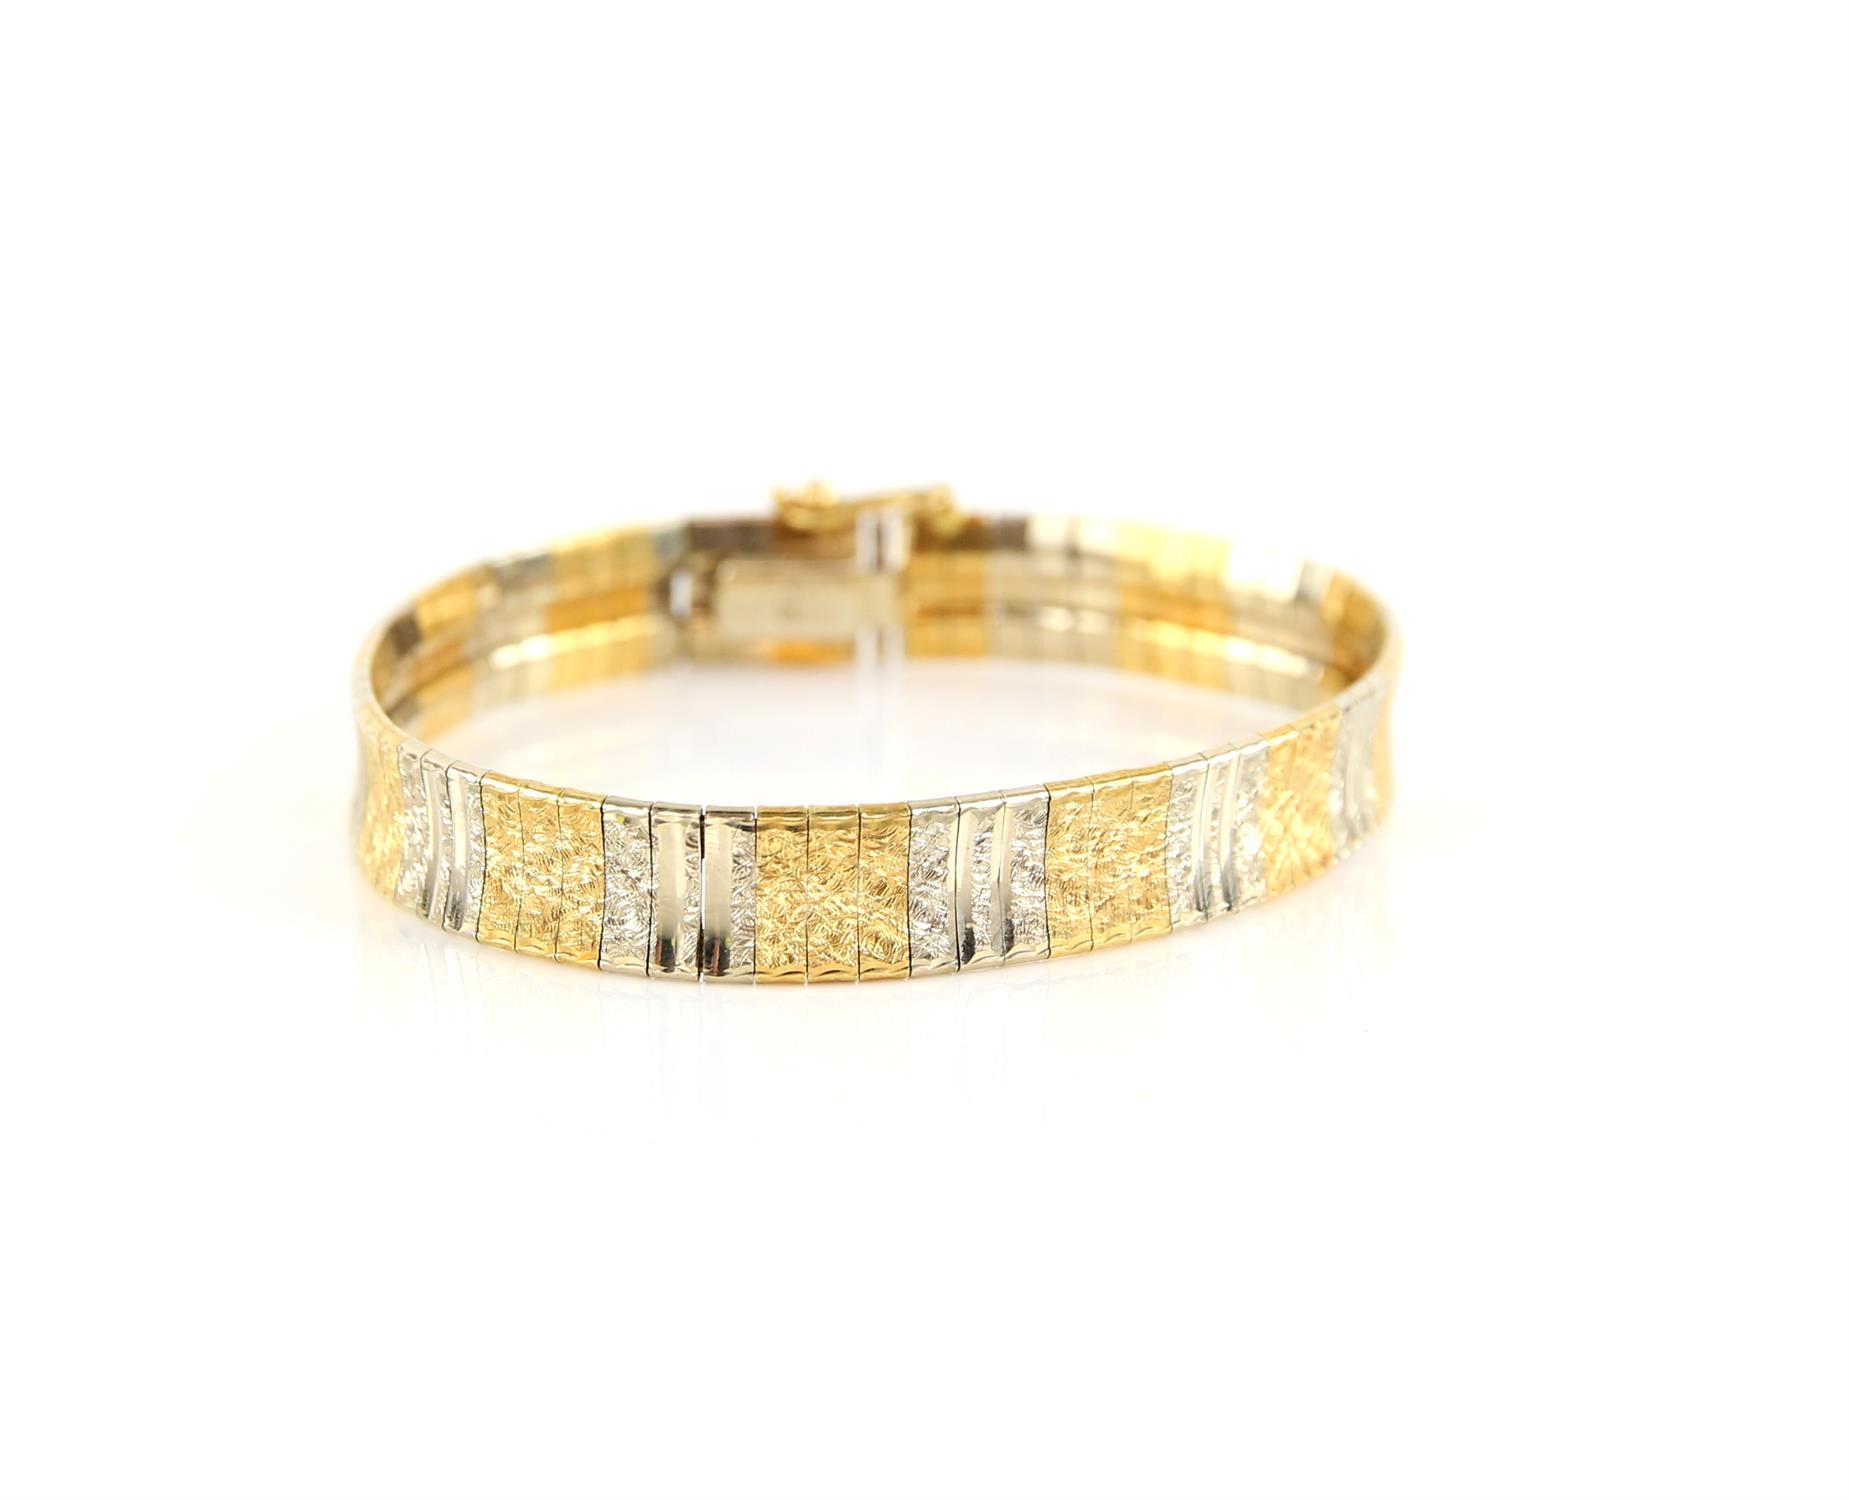 Bi-colour gold fancy link bracelet, with engraved and polished concave gold links,